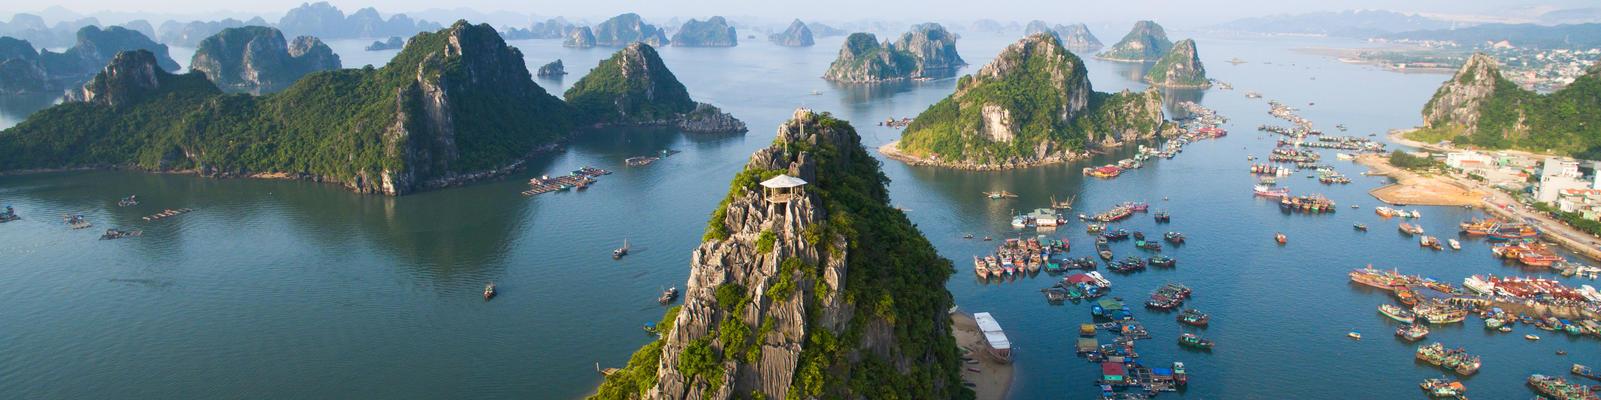 Halong Bay (Photo:Jimmy Tran/Shutterstock)